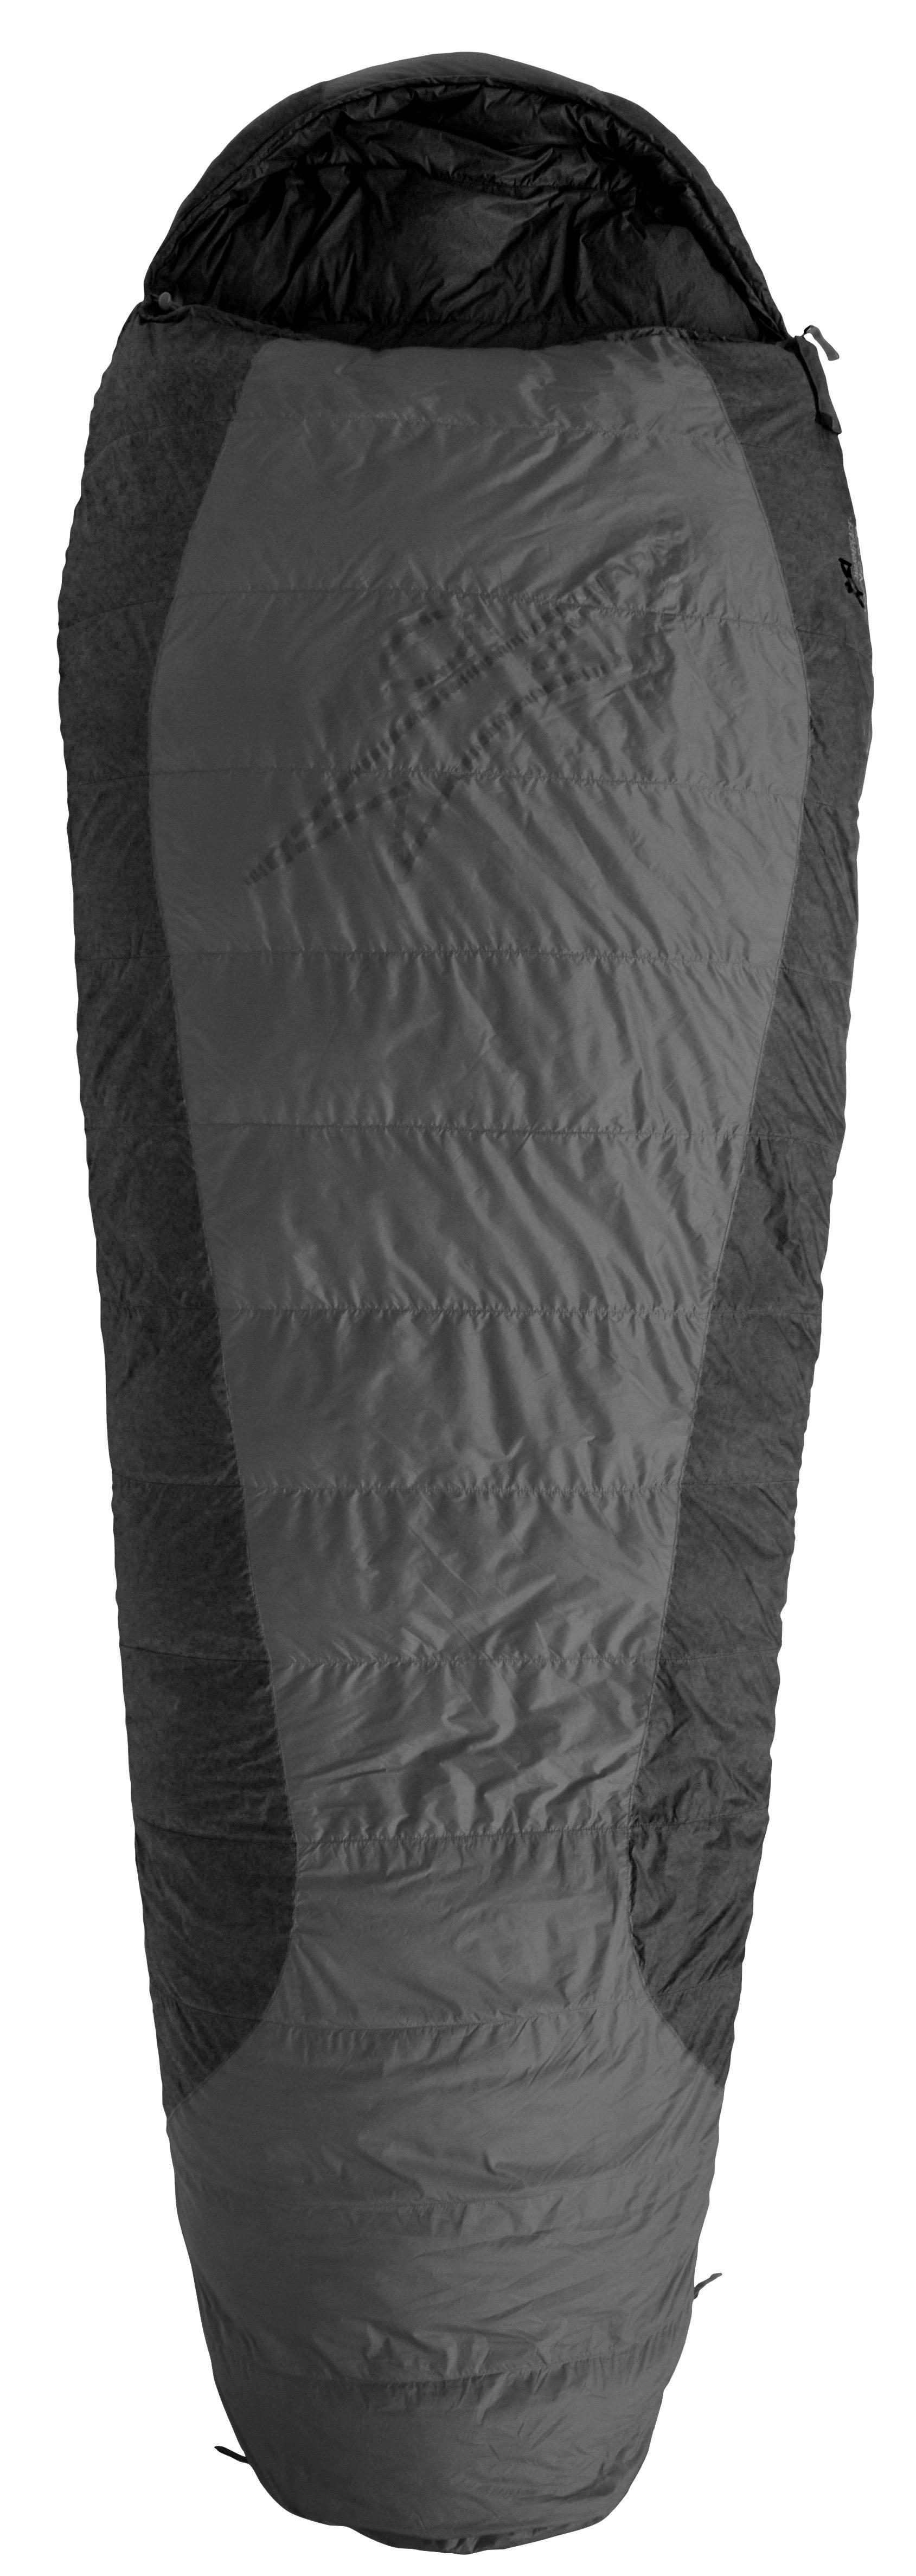 Warmpeace Sac de dormit puf Warmpeace Viking 900 - Gri